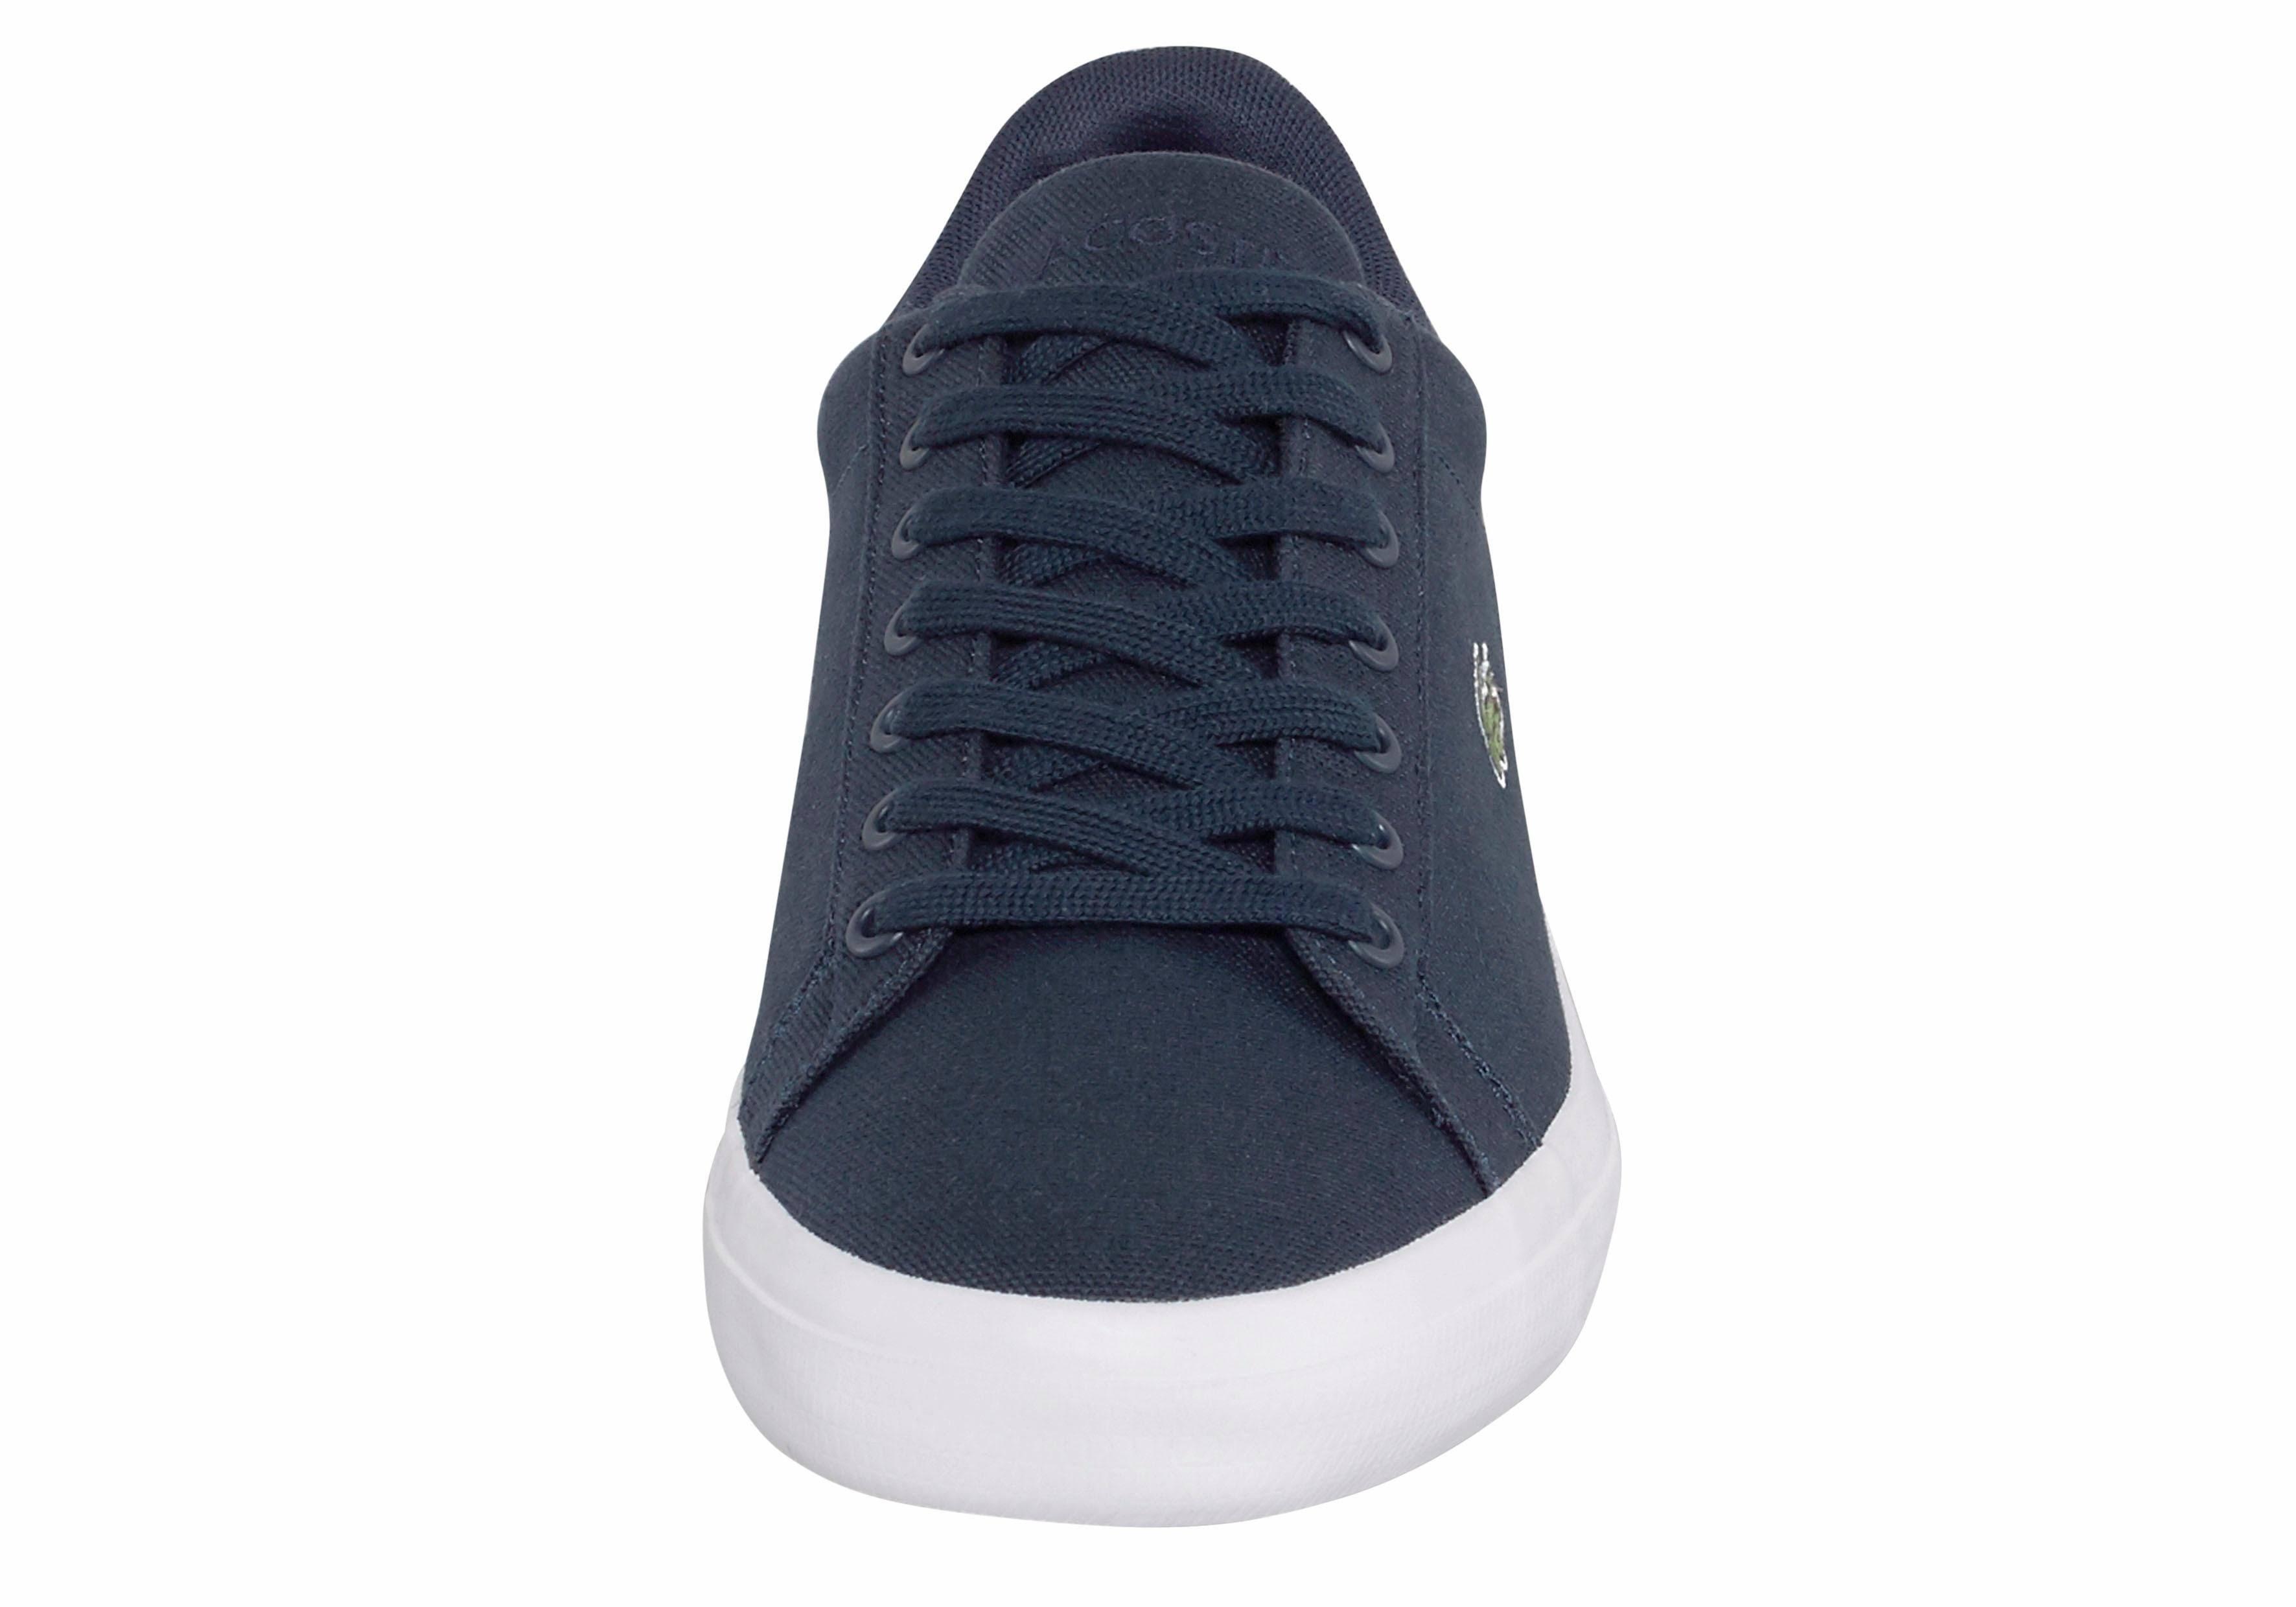 41 Lerond Bl Blauw In Blauw Lacoste Heren Ii Sneaker xAwTHR6qU